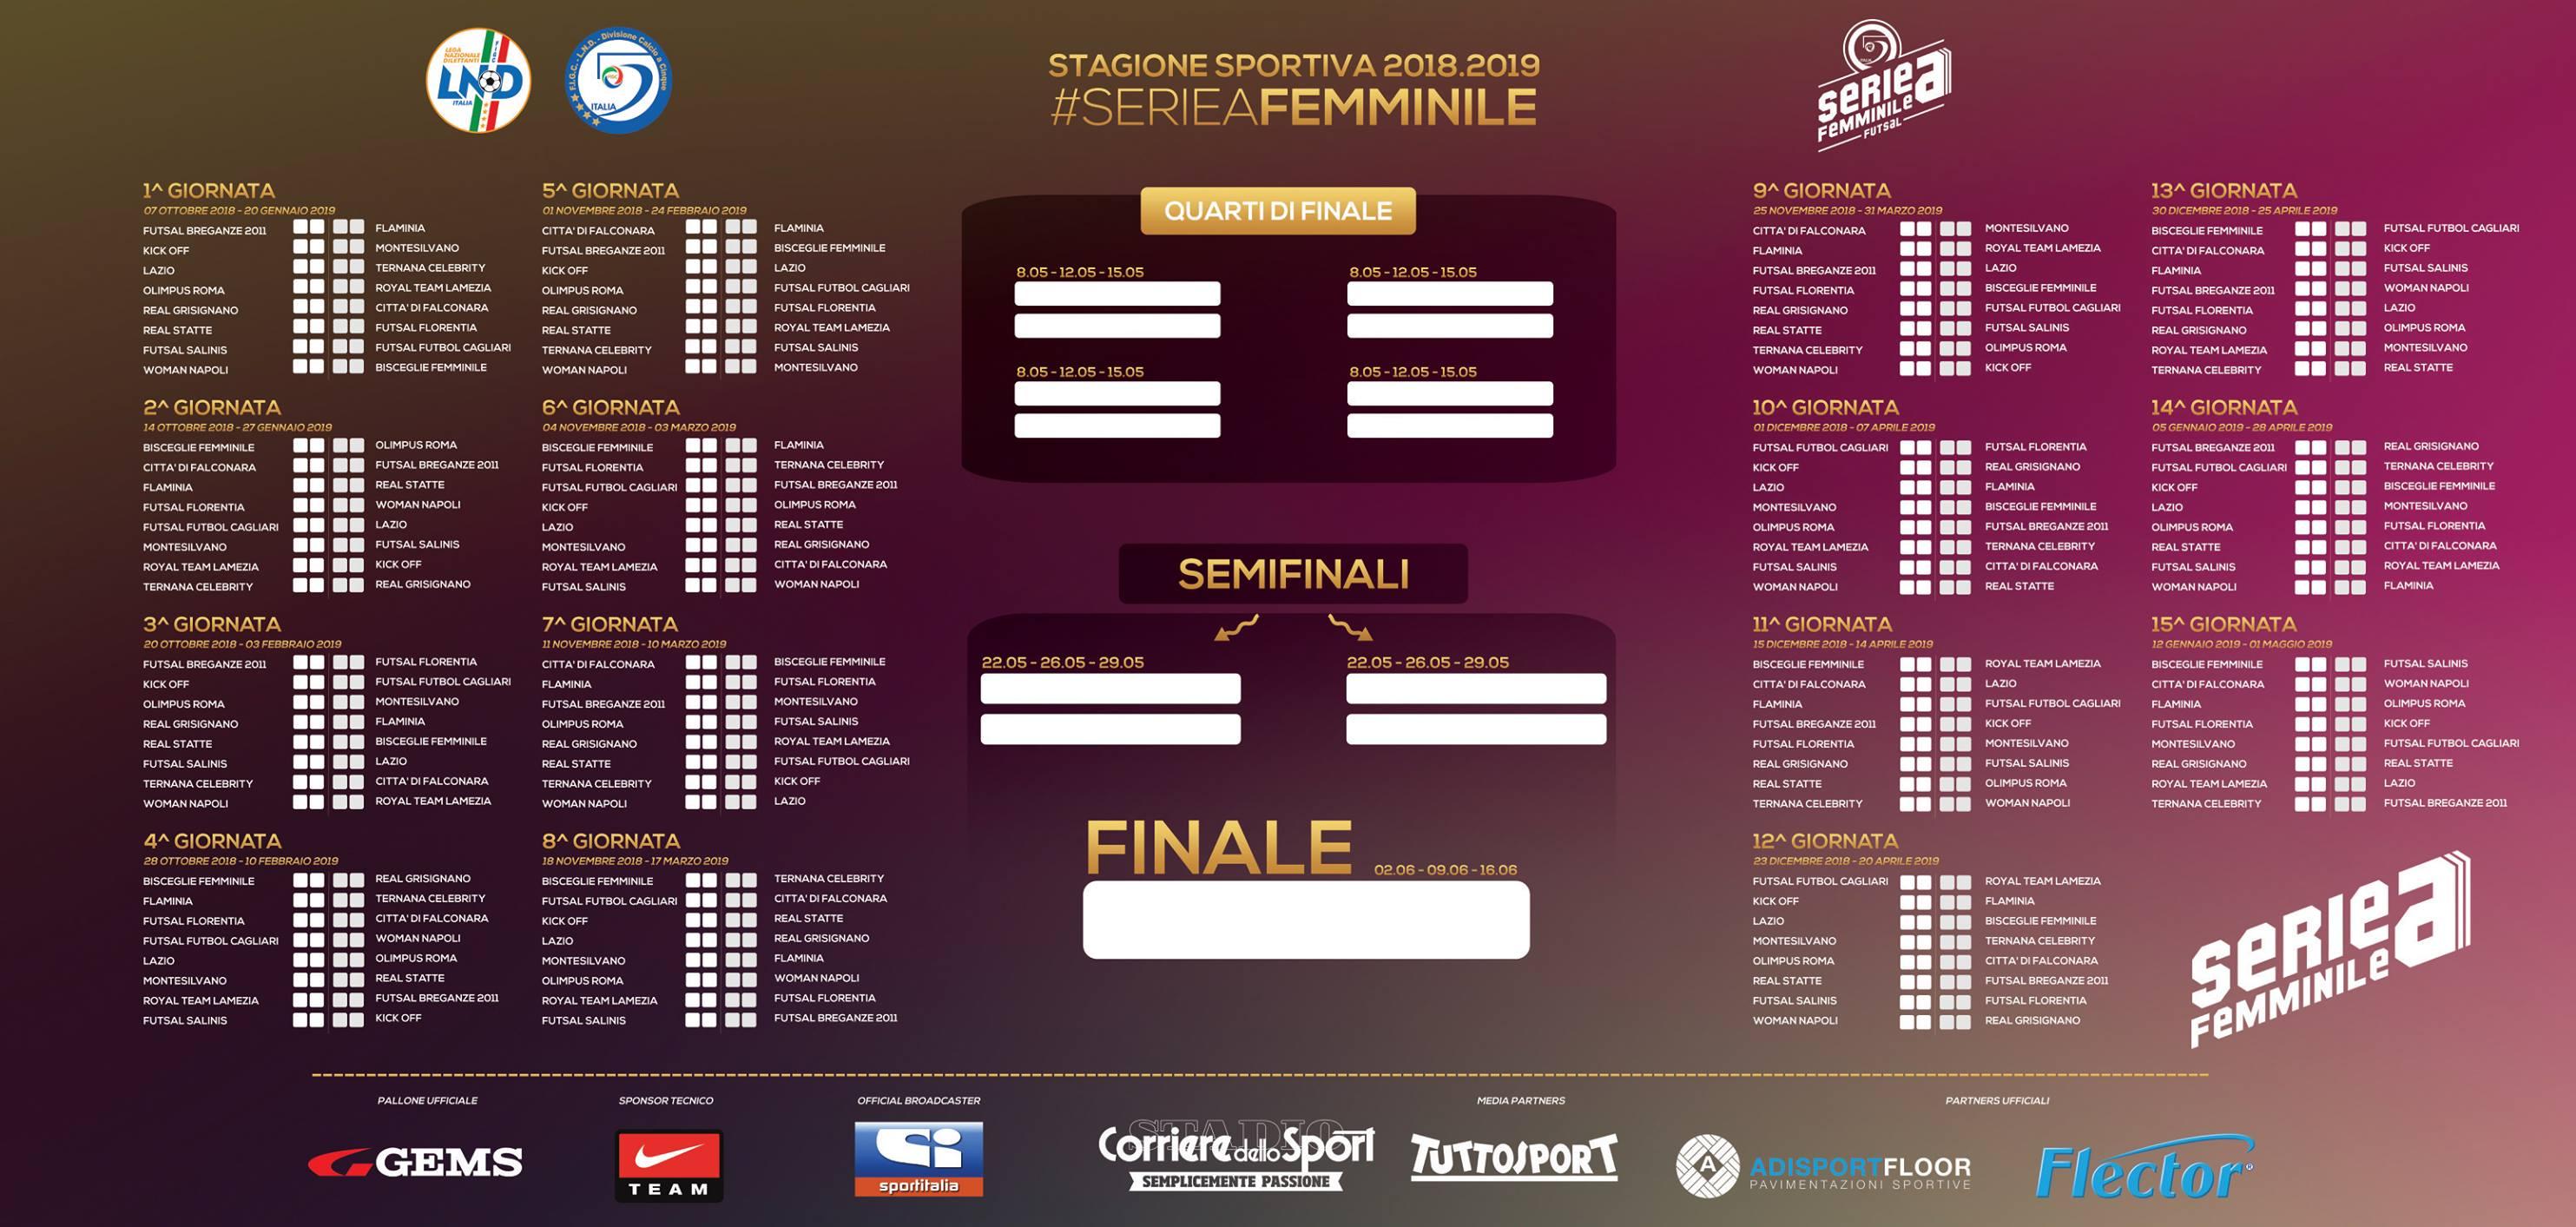 Calendario Esami Roma Tre.Calendario Serie A Femminile 2018 2019 Ogni Maledetta